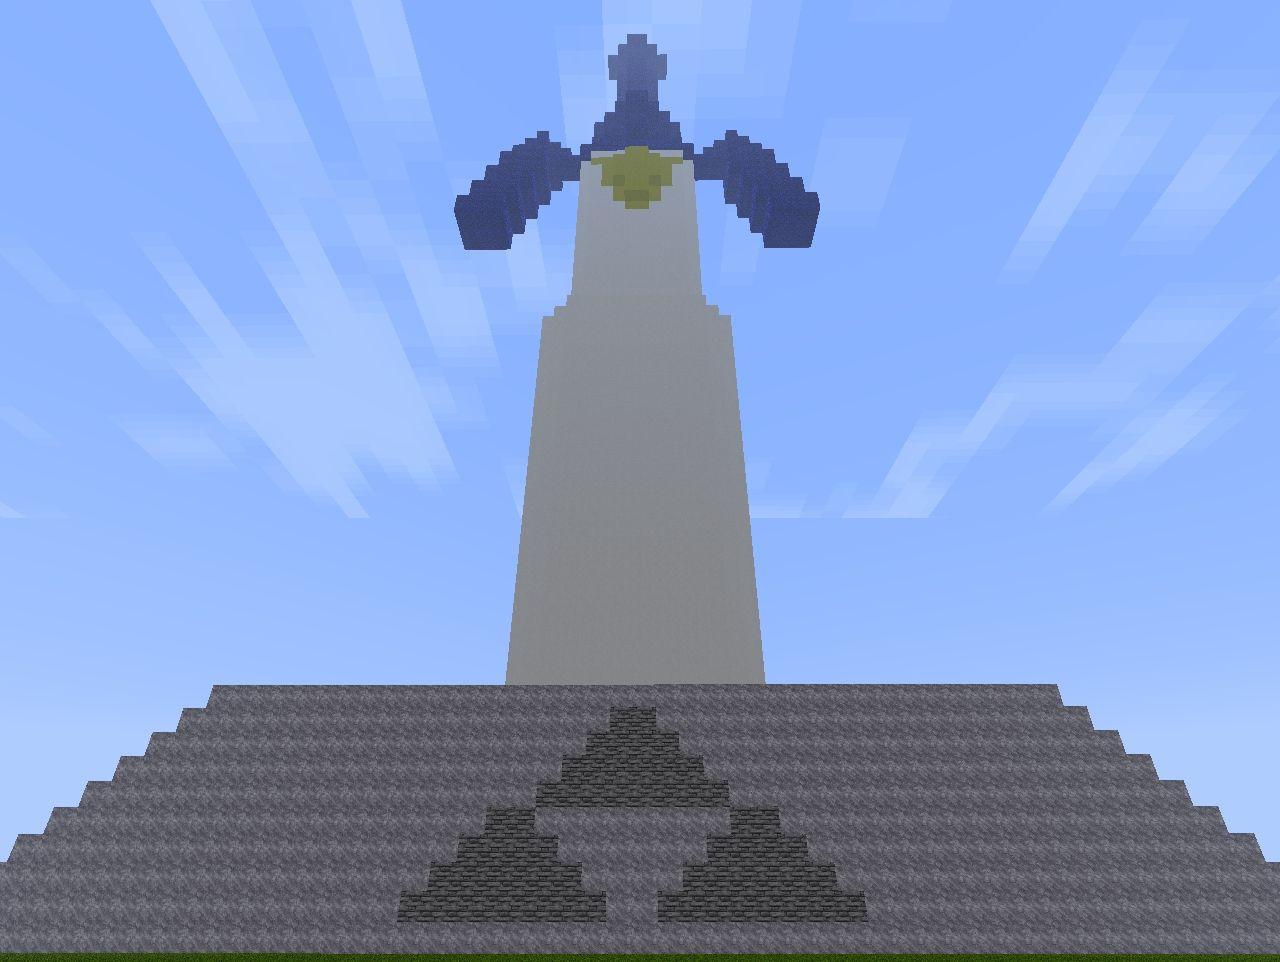 the master sword legend of zelda ocarina of time